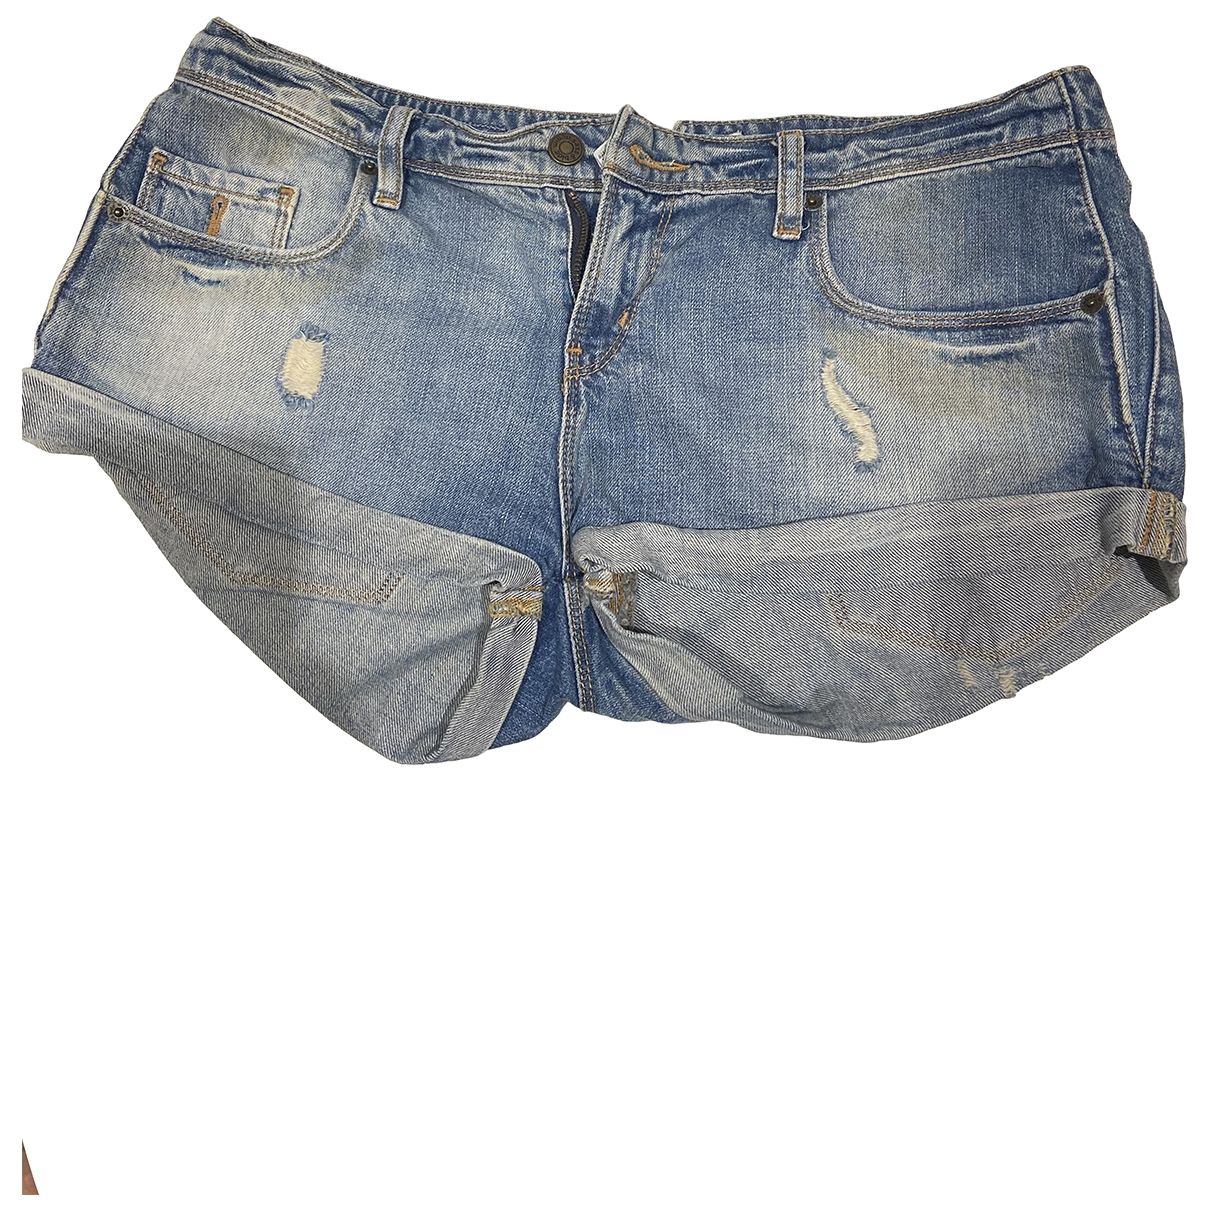 Sass & Bide \N Blue Denim - Jeans Shorts for Women 6 US